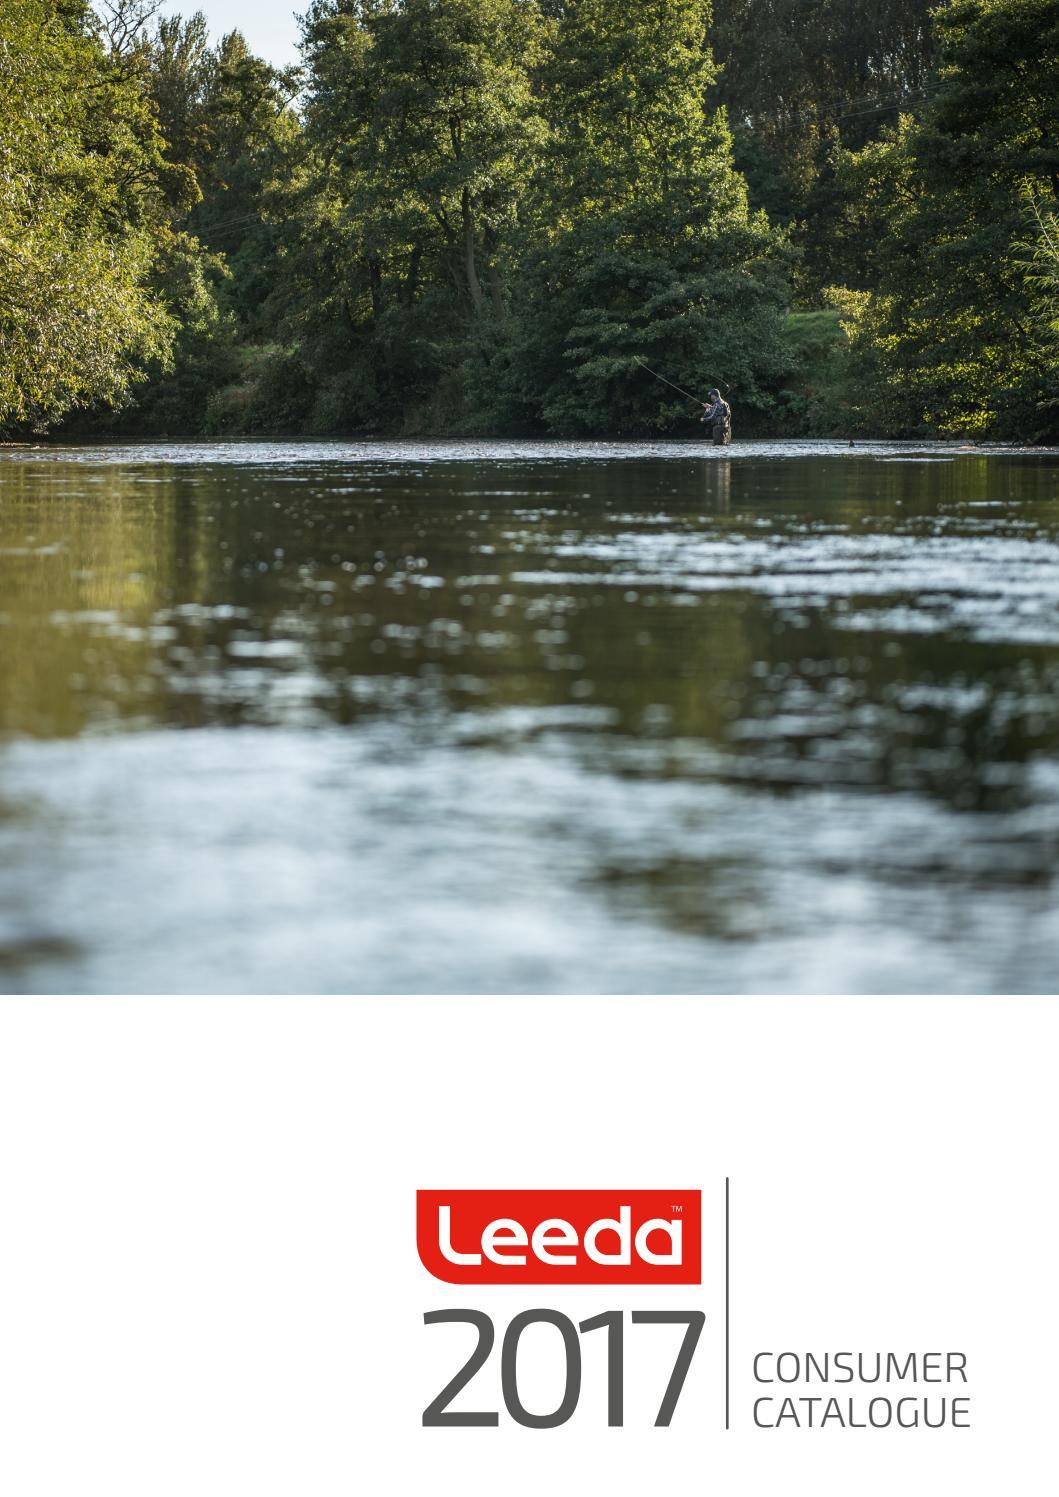 LEEDA Profil Pro Fly Box Storage ALL SIZES